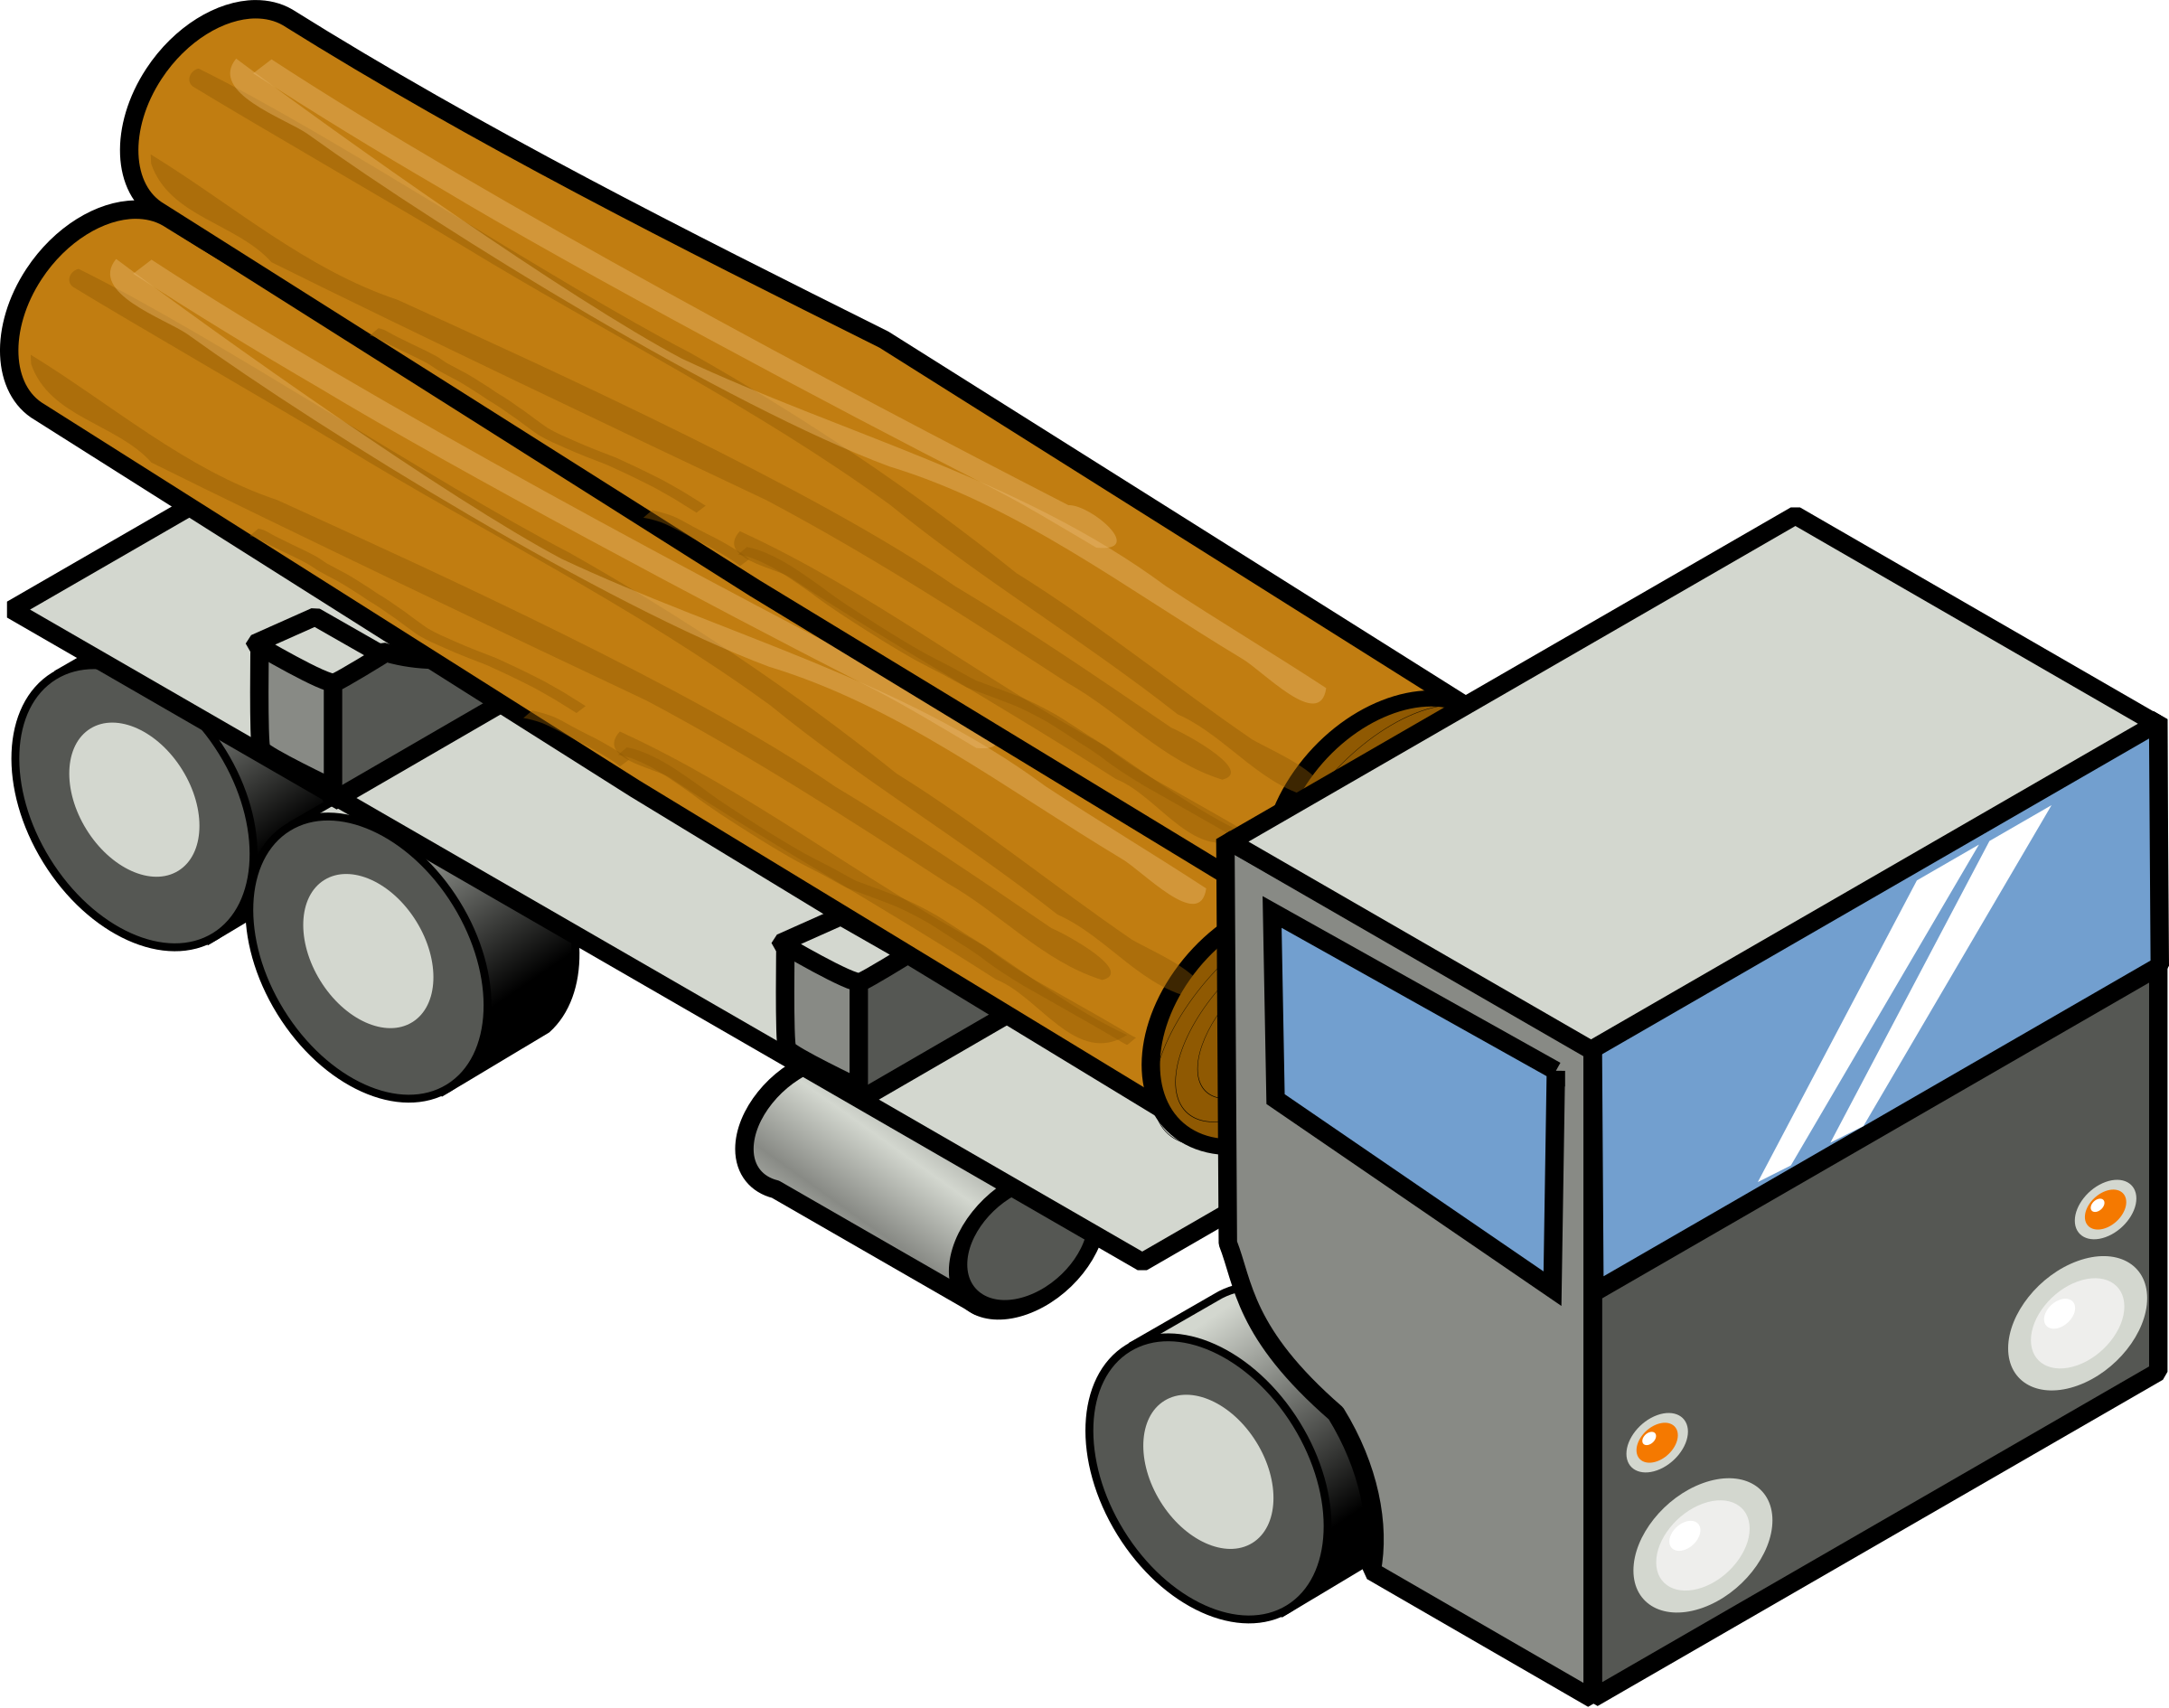 2400x1890 Transportation Clip Art Image Free